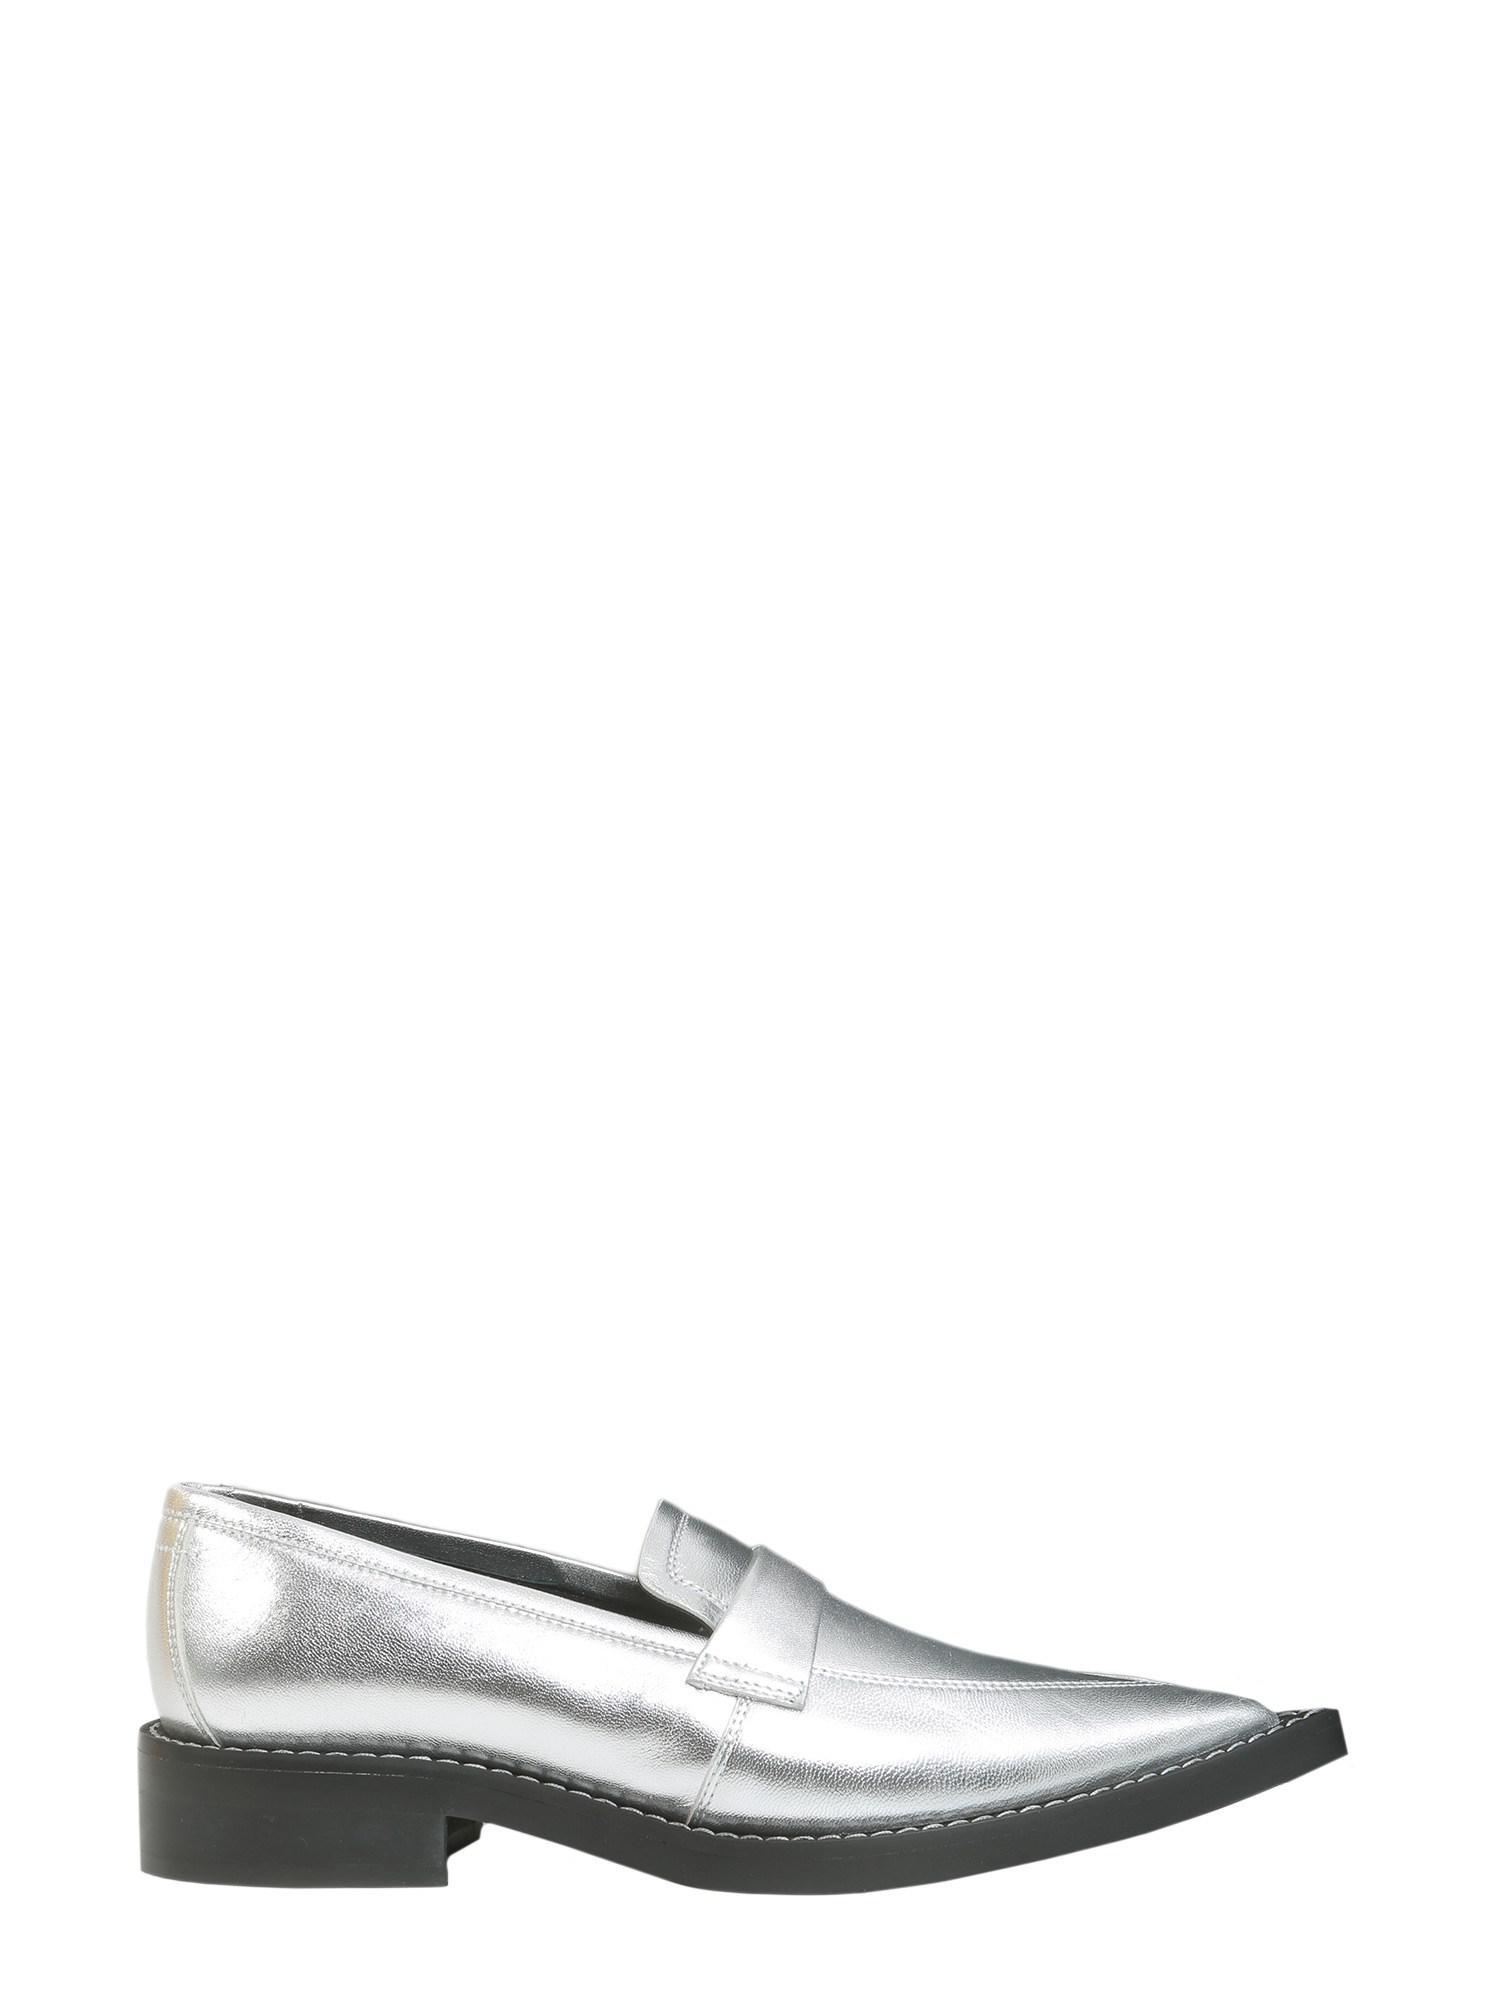 pointed toe loafers - Black Maison Martin Margiela dtI2tA5VNp